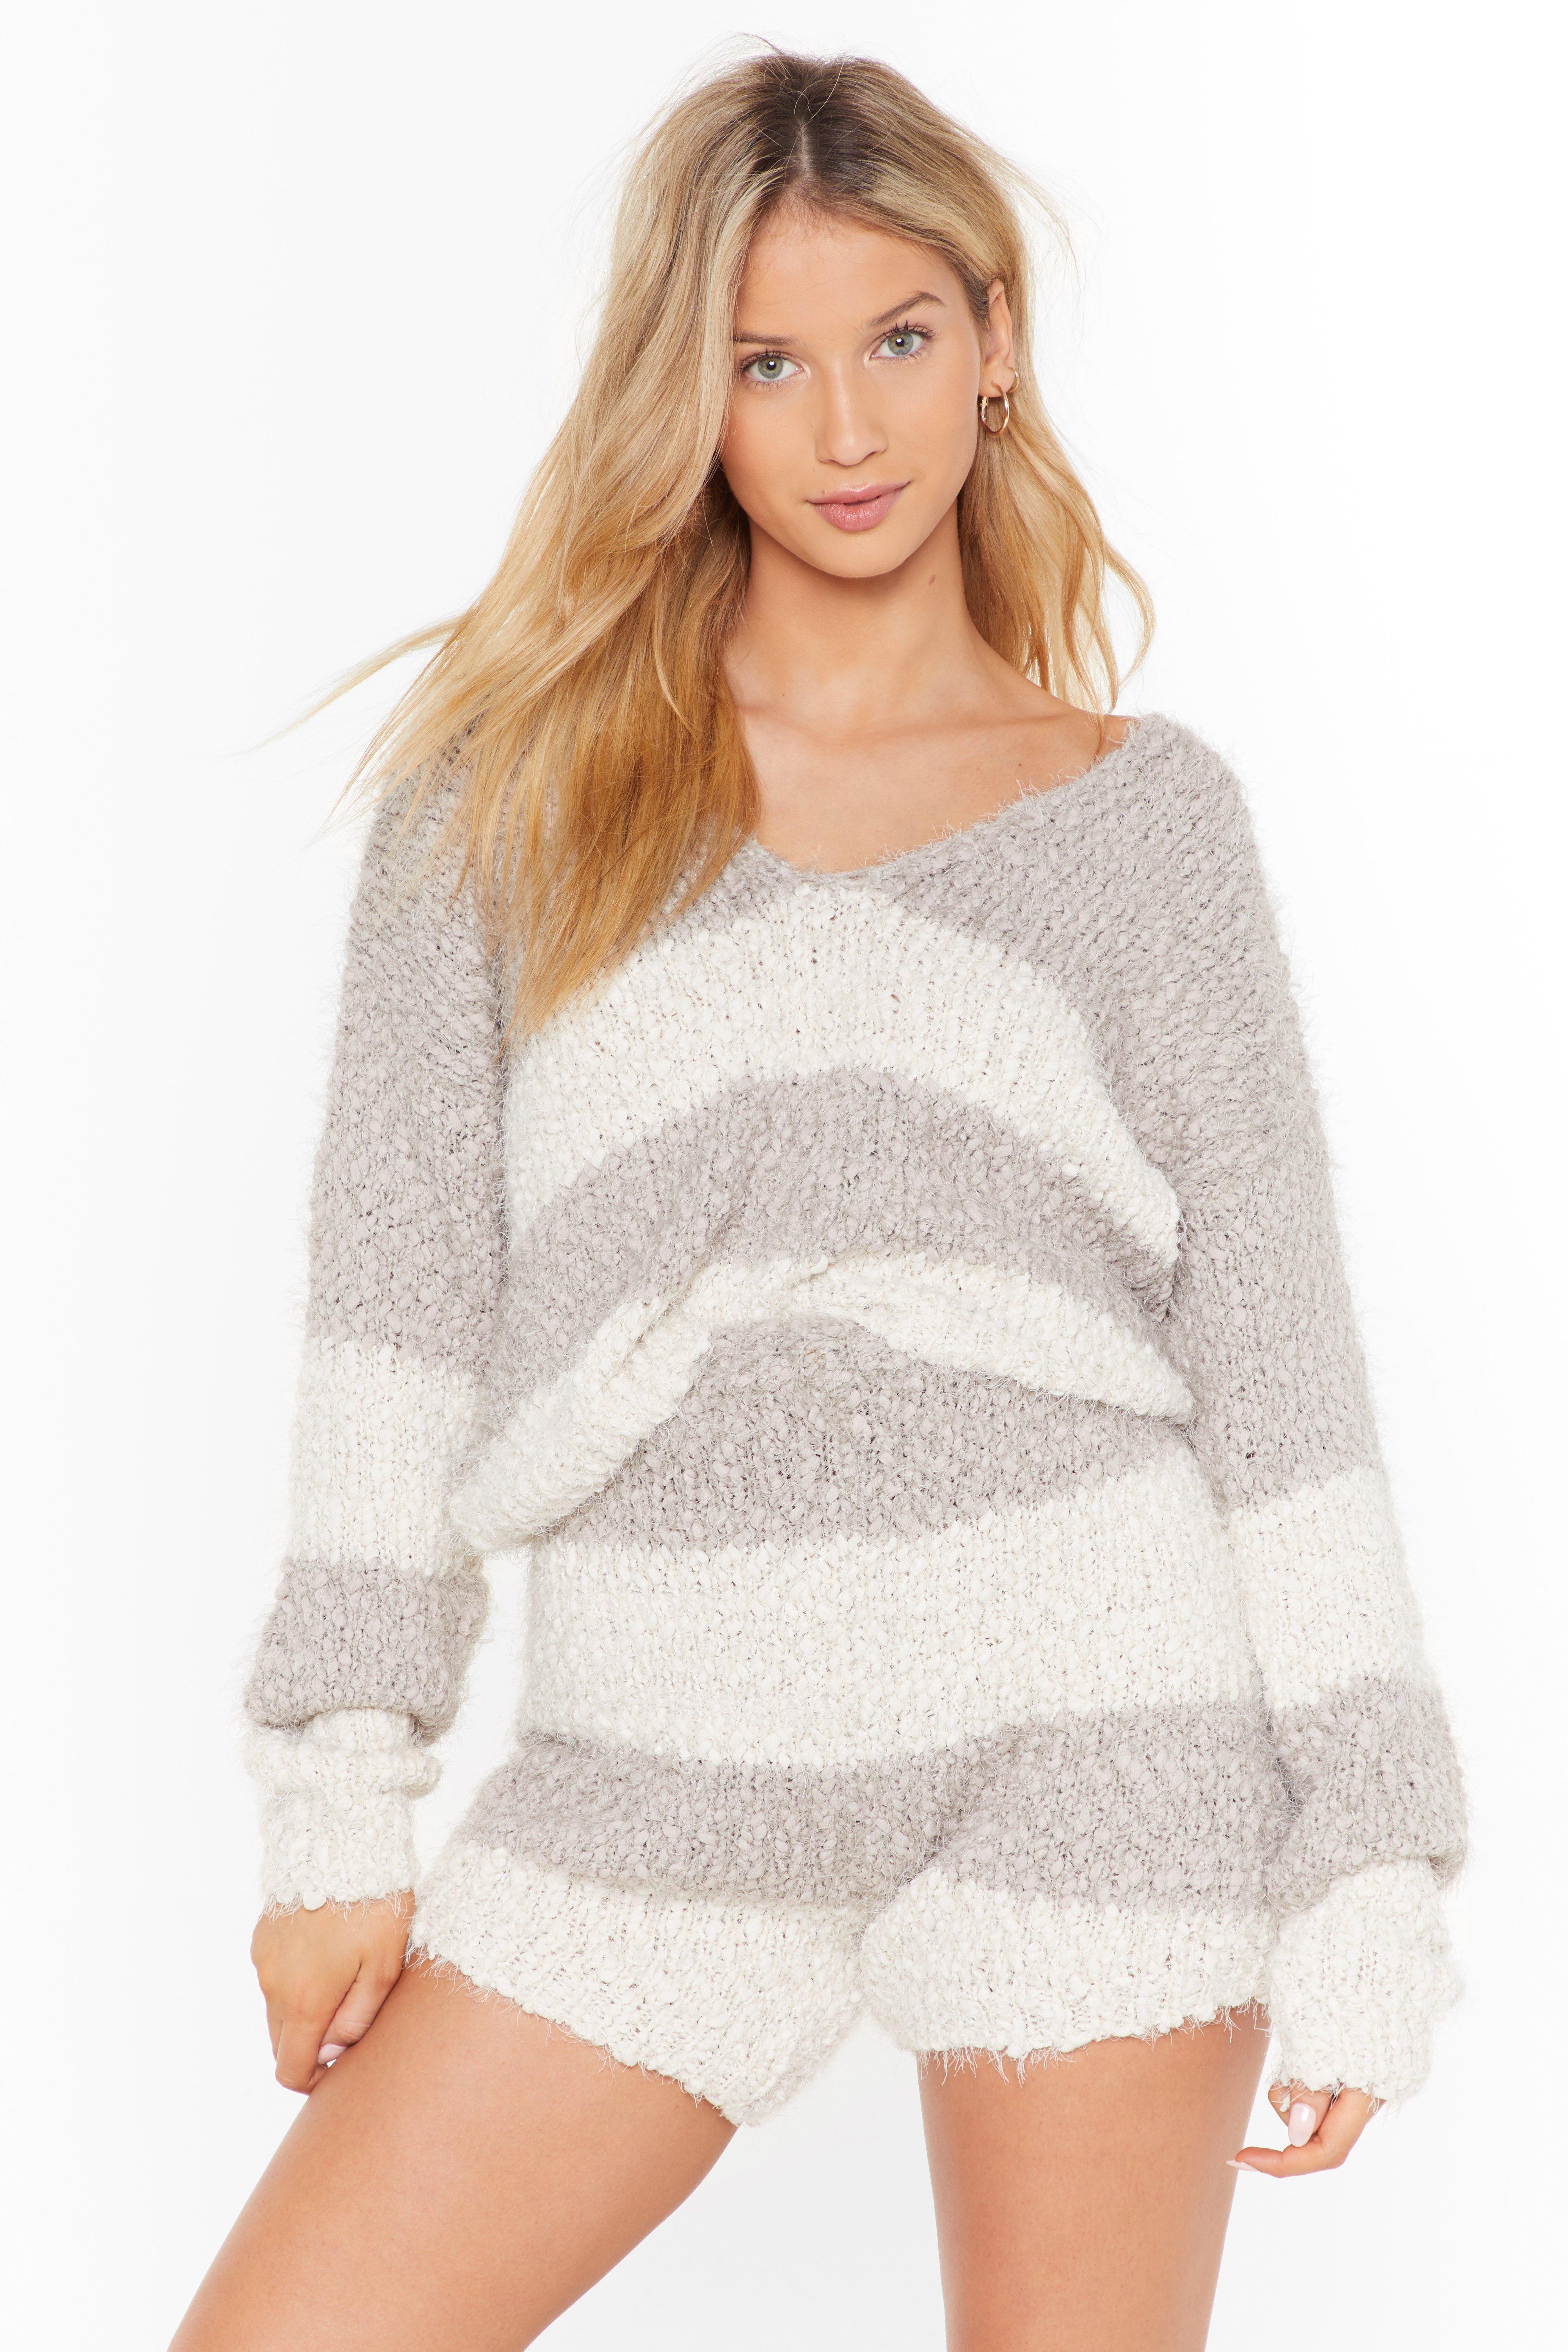 Image of Stripe tape yarn knitted lounge top & short set